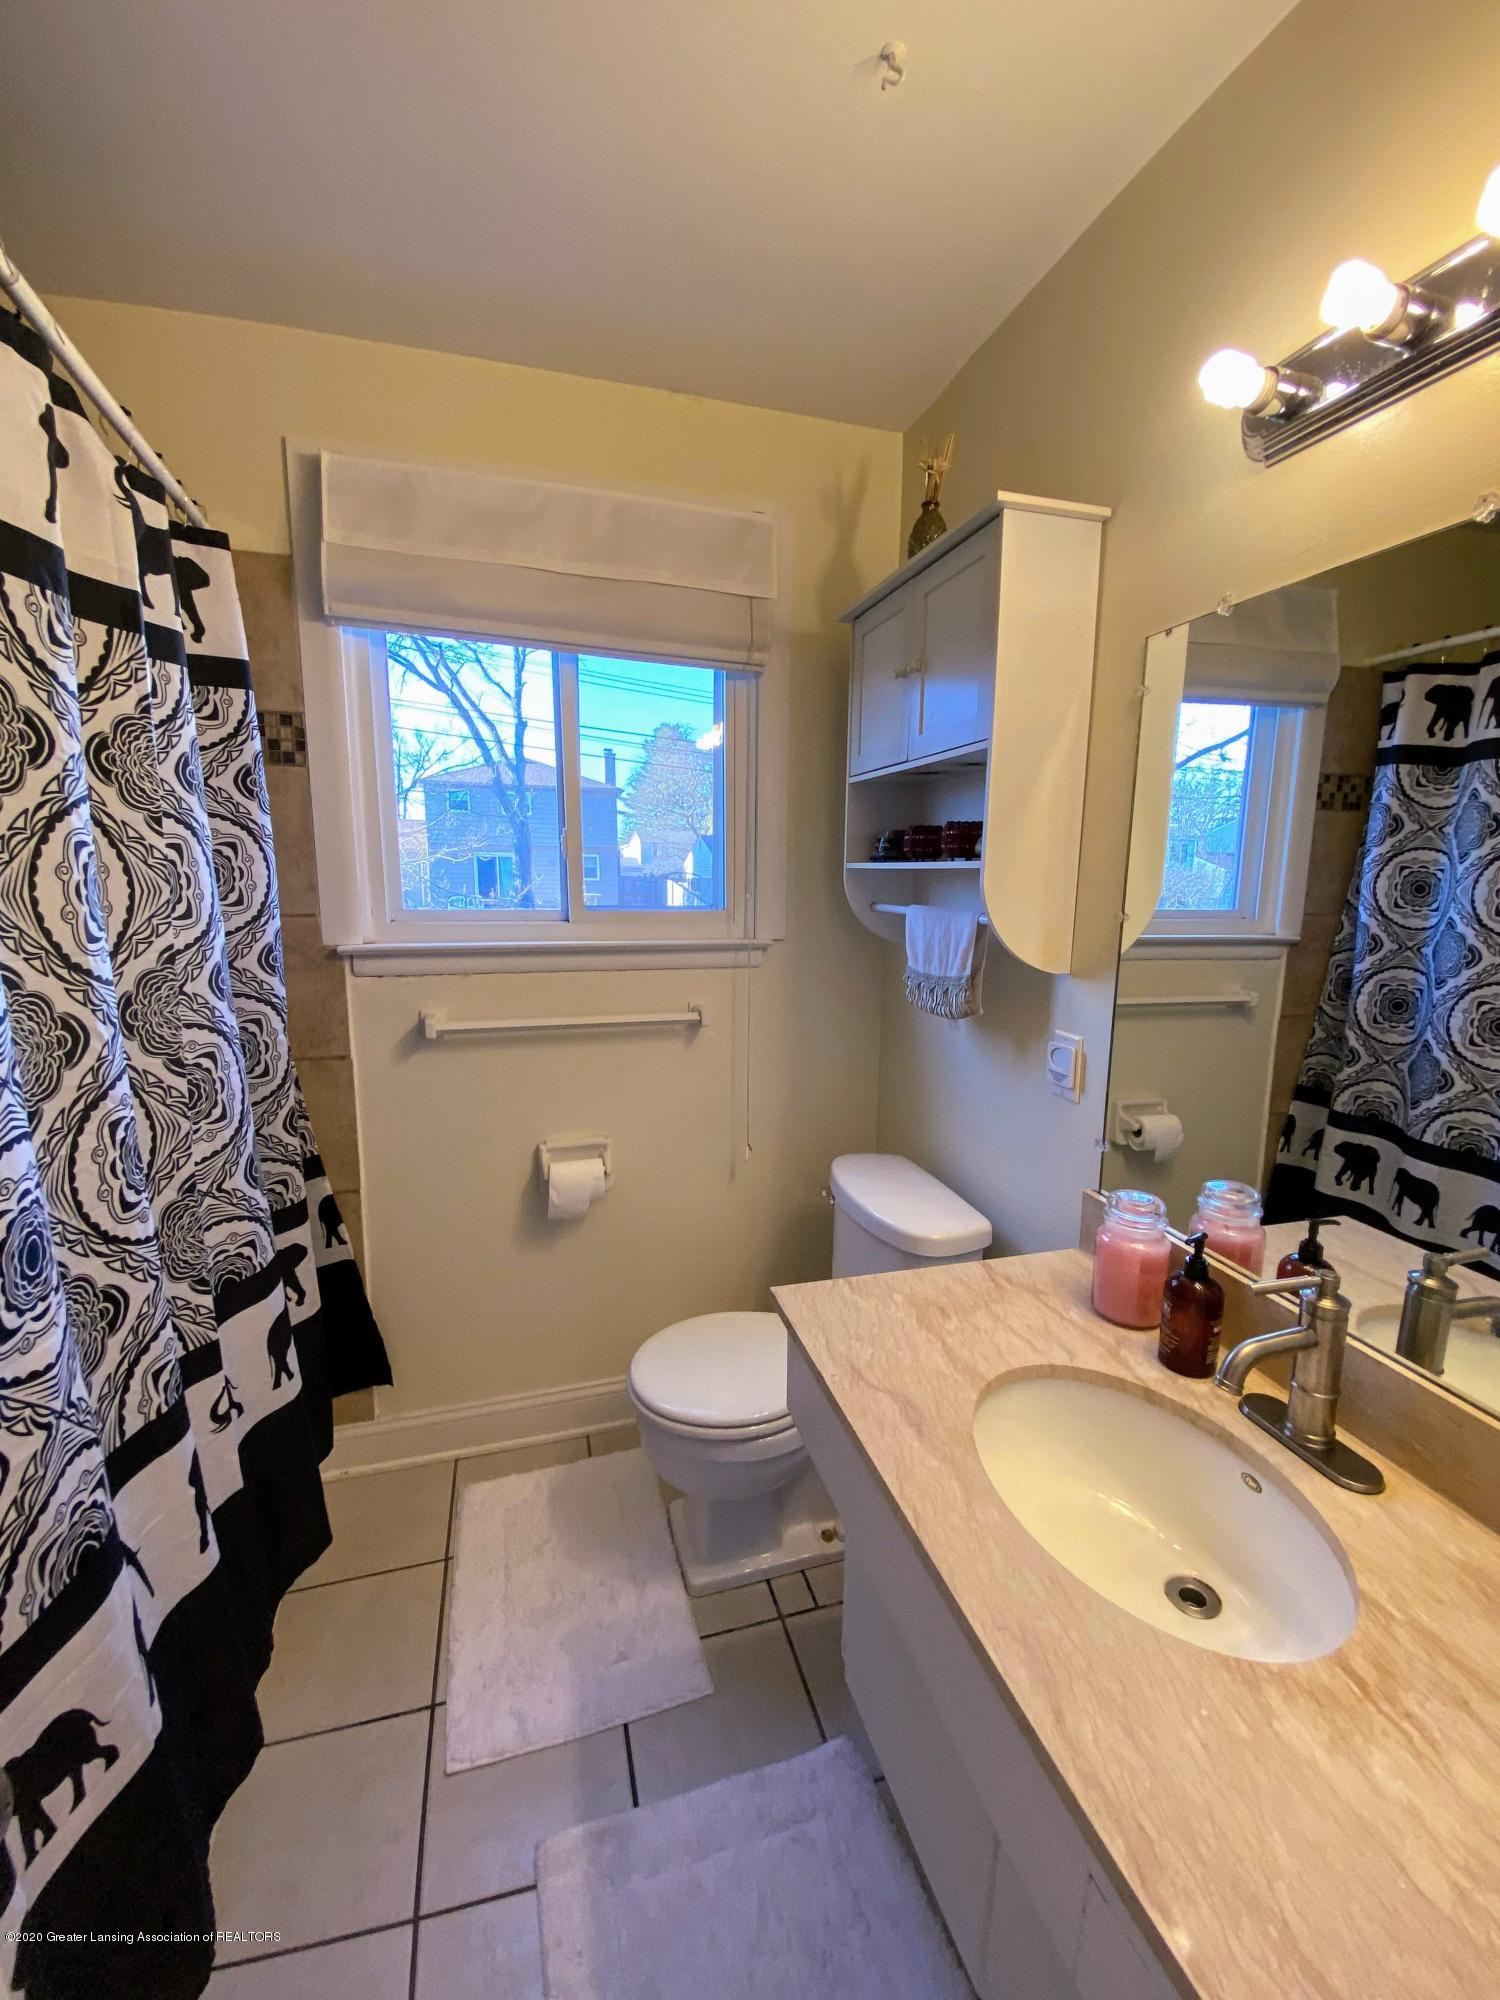 2703 Groesbeck Ave - Bathroom - 10